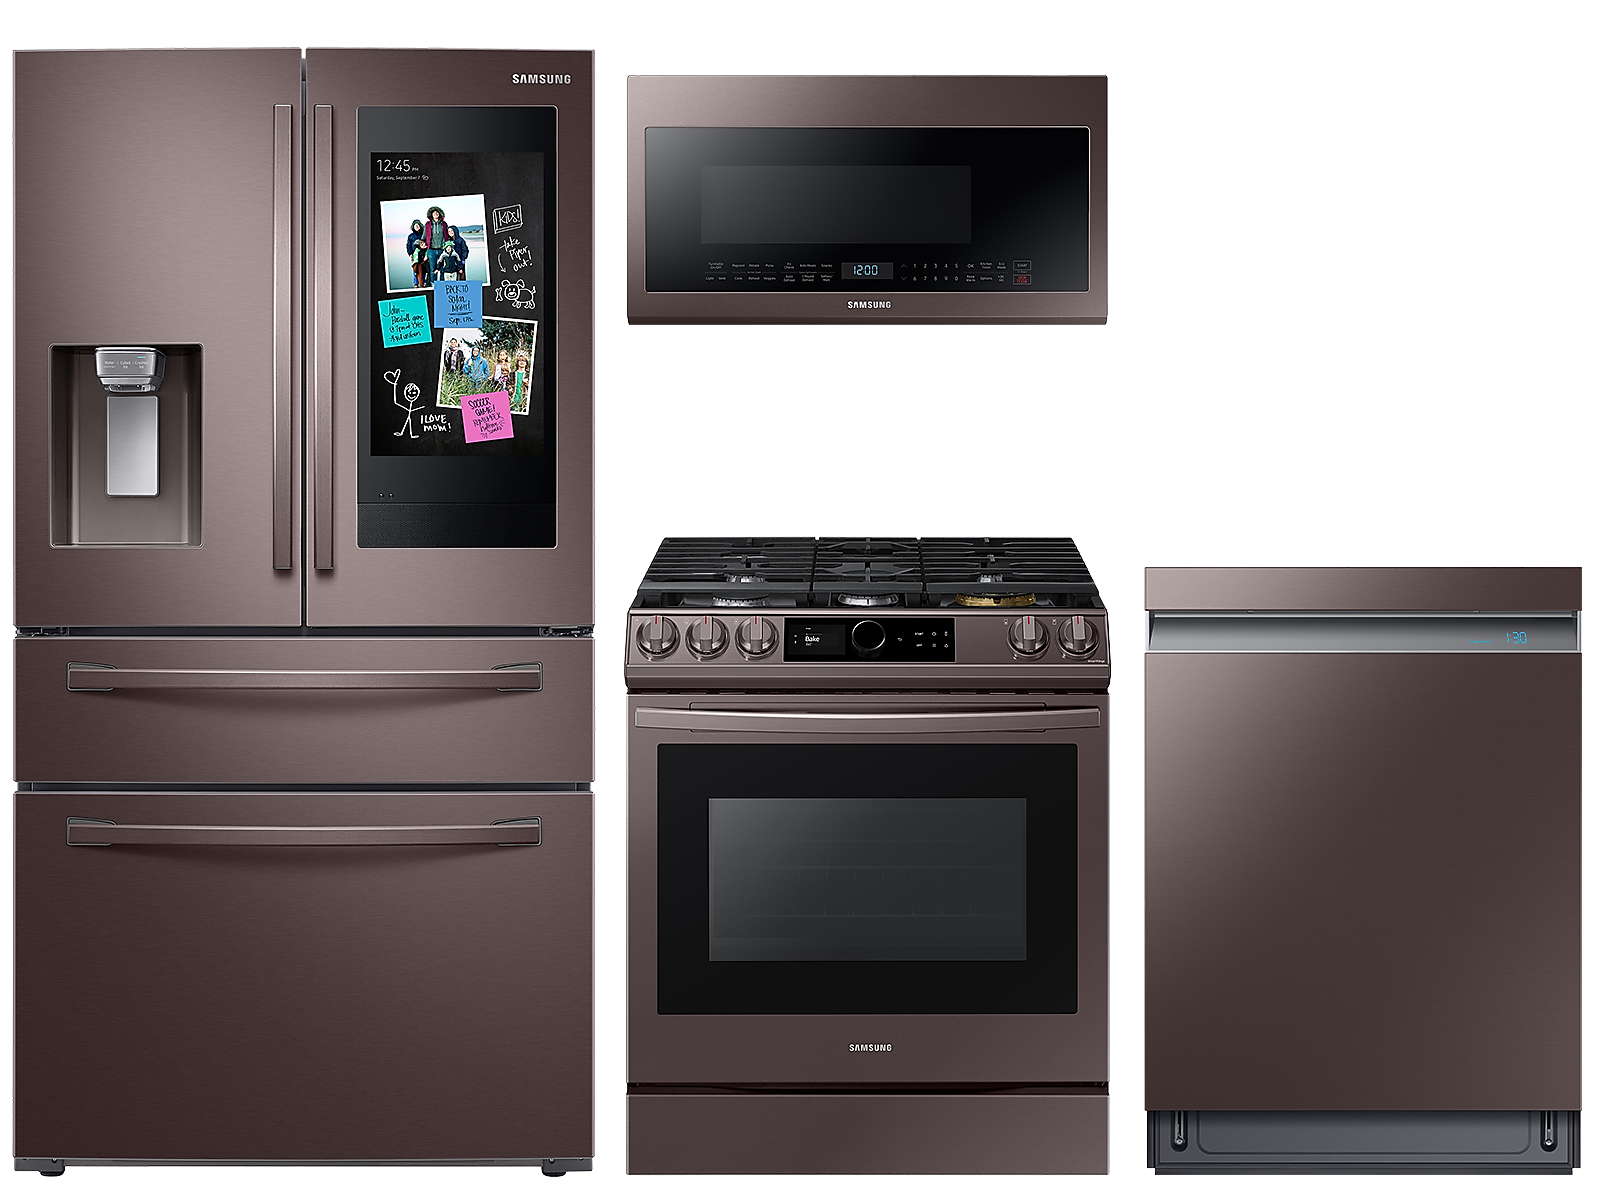 Samsung coupon: Samsung 22 cu. ft. counter depth 4-door Family HubTM refrigerator, gas range, 2.1 cu. ft. microwave and Smart Linear dishwasher package